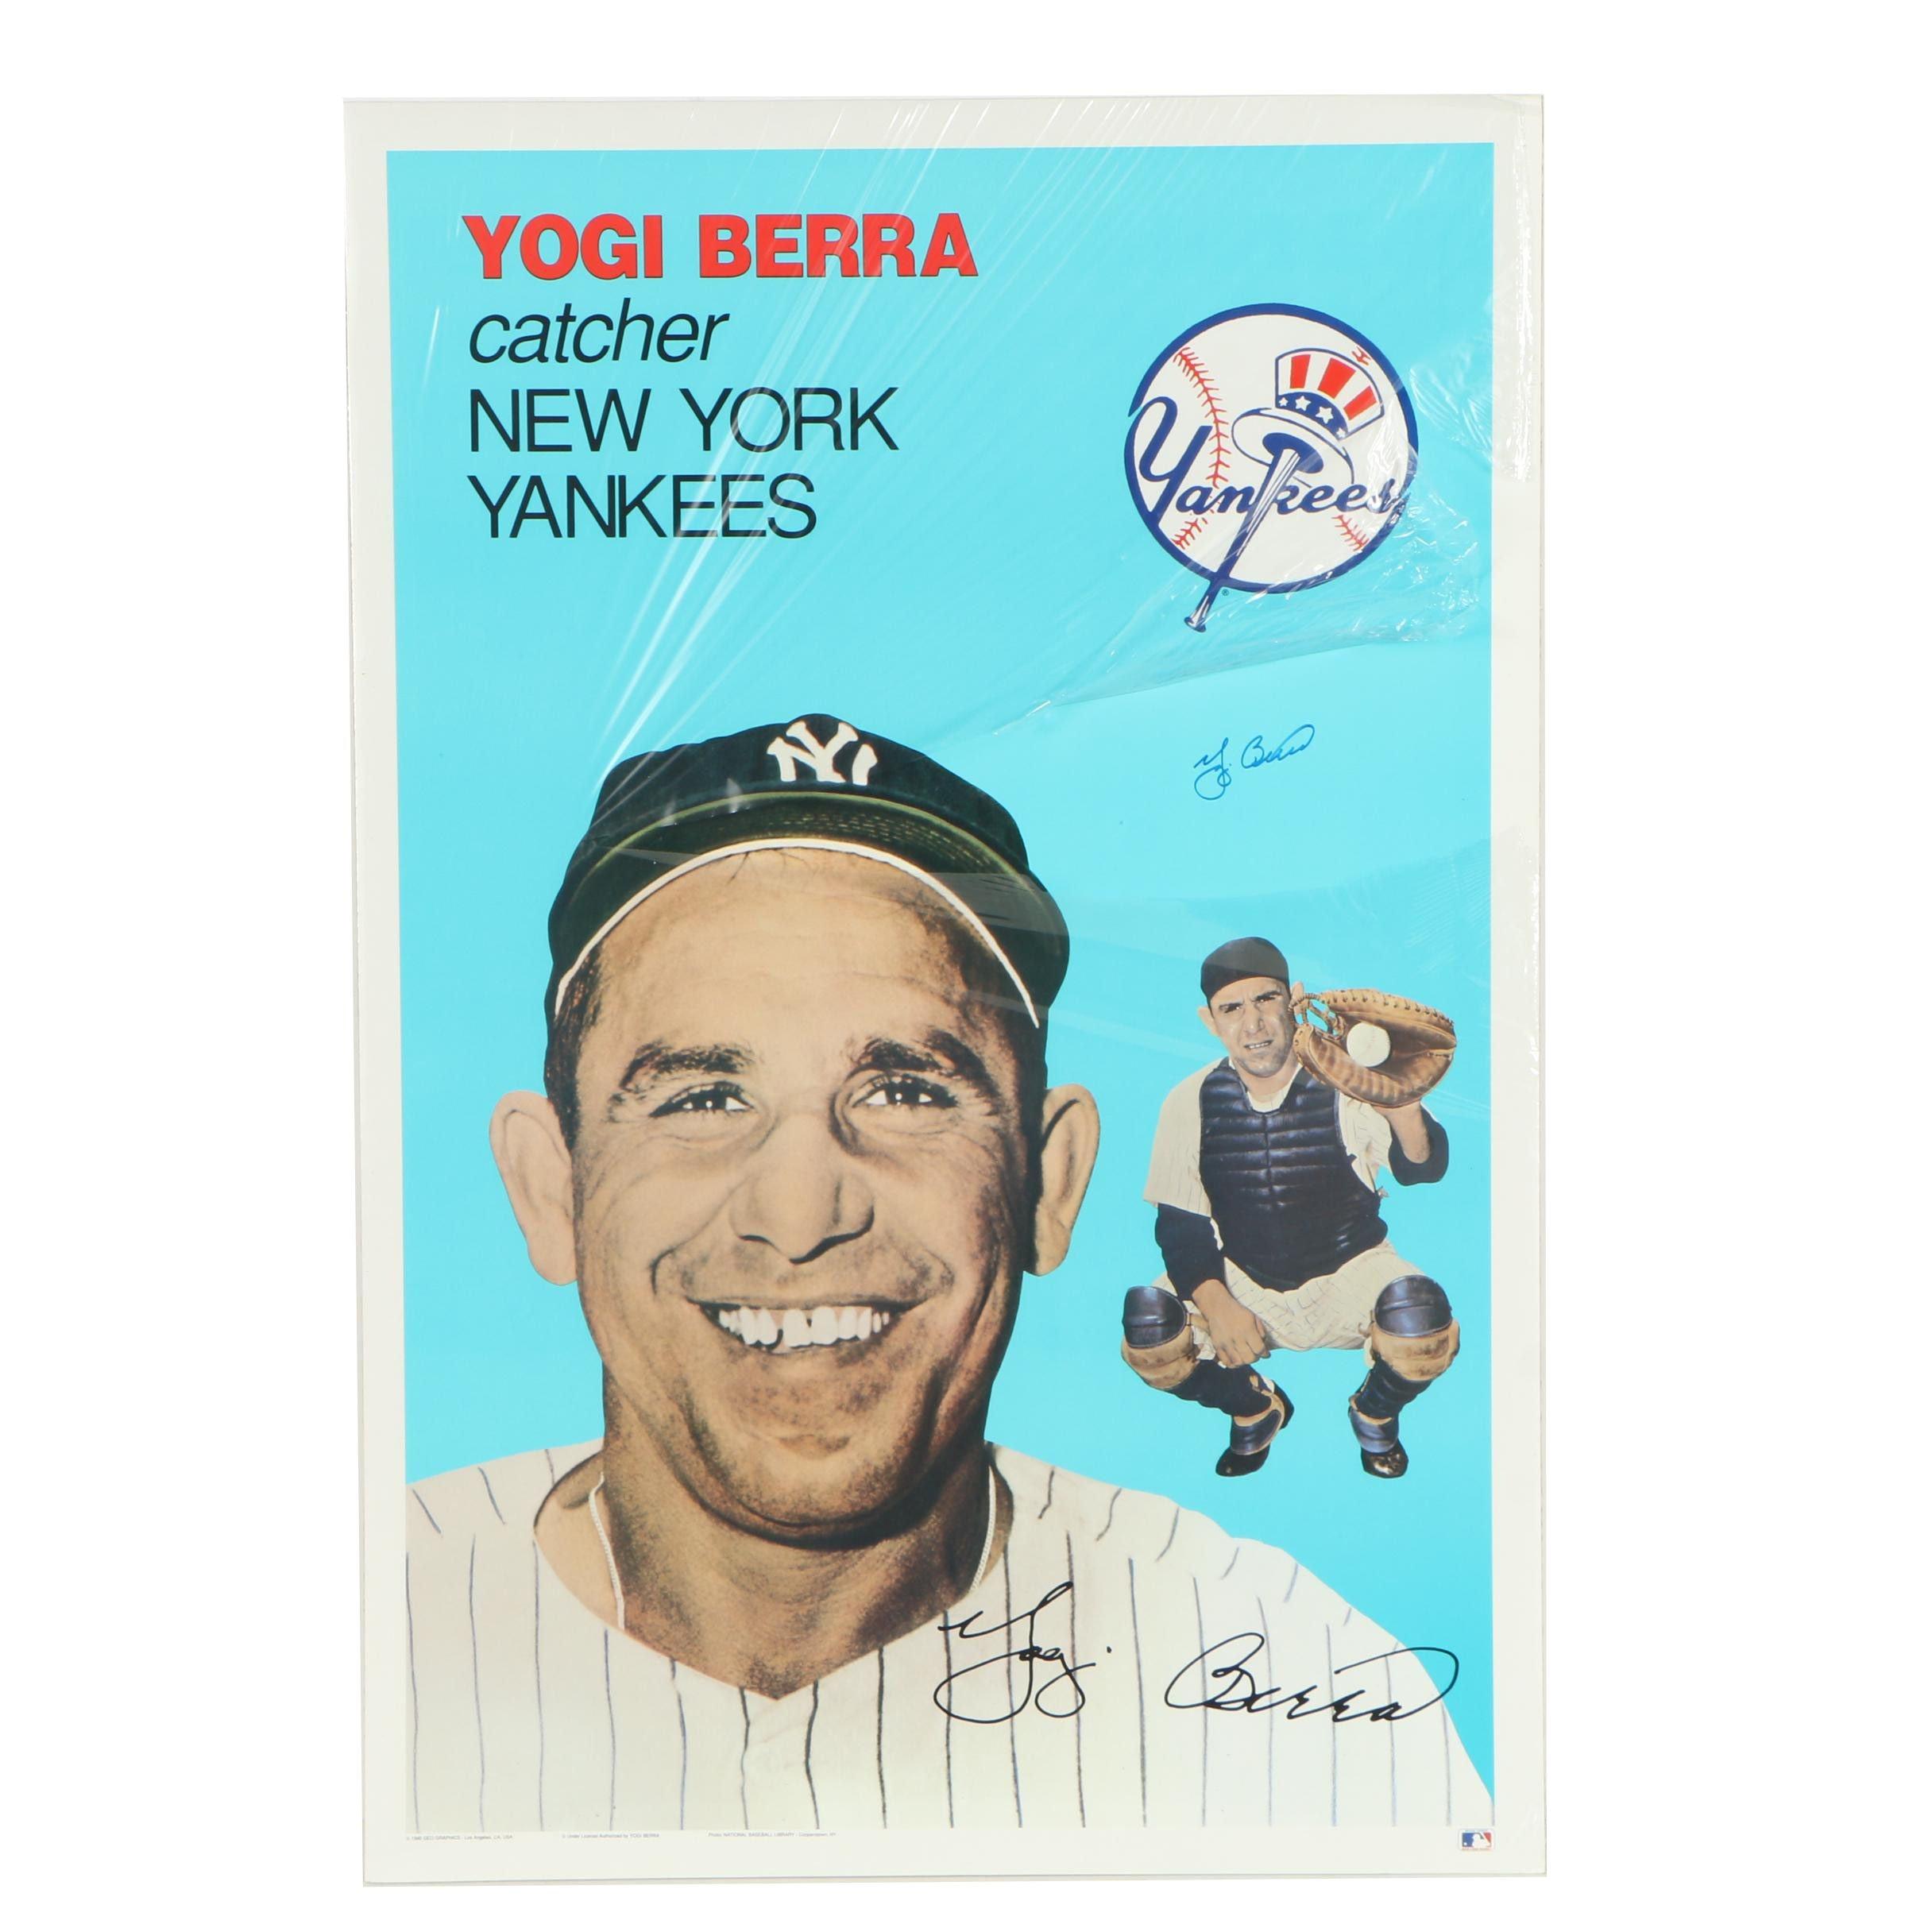 Yogi Berra Autographed New York Yankees Poster